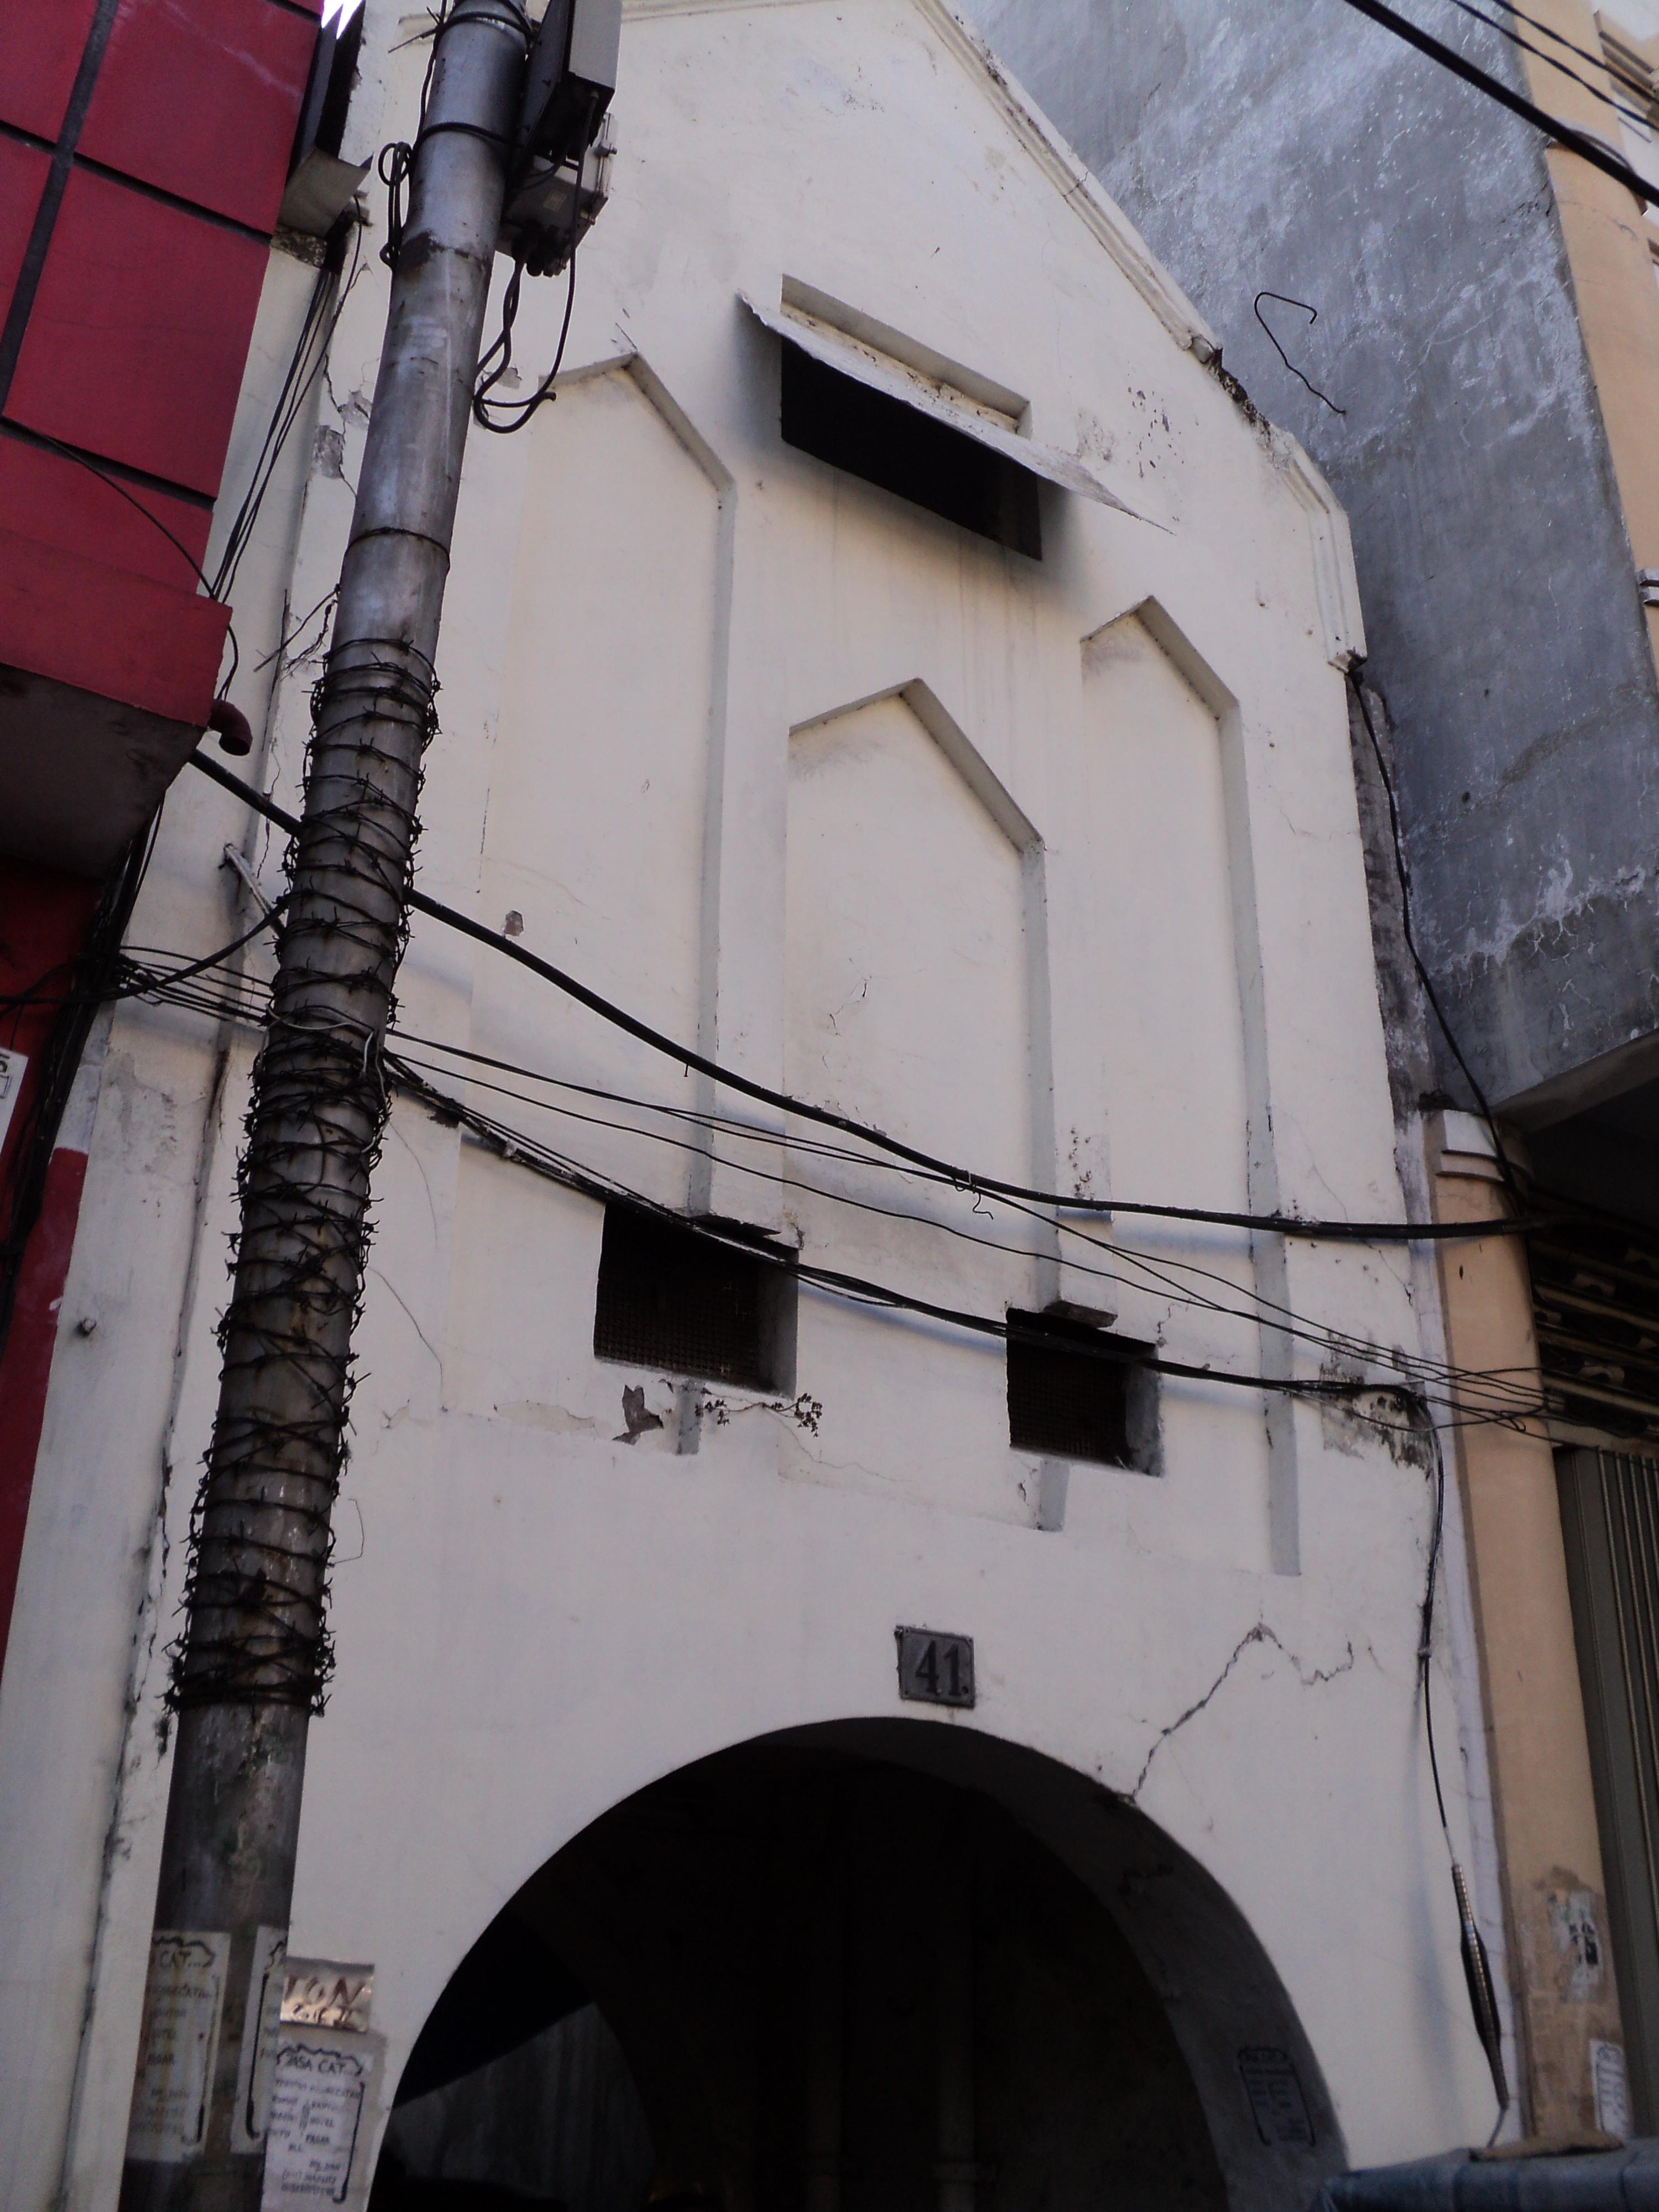 tampak depan dari sebuah bangunan yang diyakini merupakan gerbang Keraton Surabaya. Secara fisik bangunan ini tampak seperti benteng Keraton Yogyakarta, namun secara material serupa dengan bangunan Belanda. (sumber foto: pesonacagarbudayasurabaya.wordpress.com)